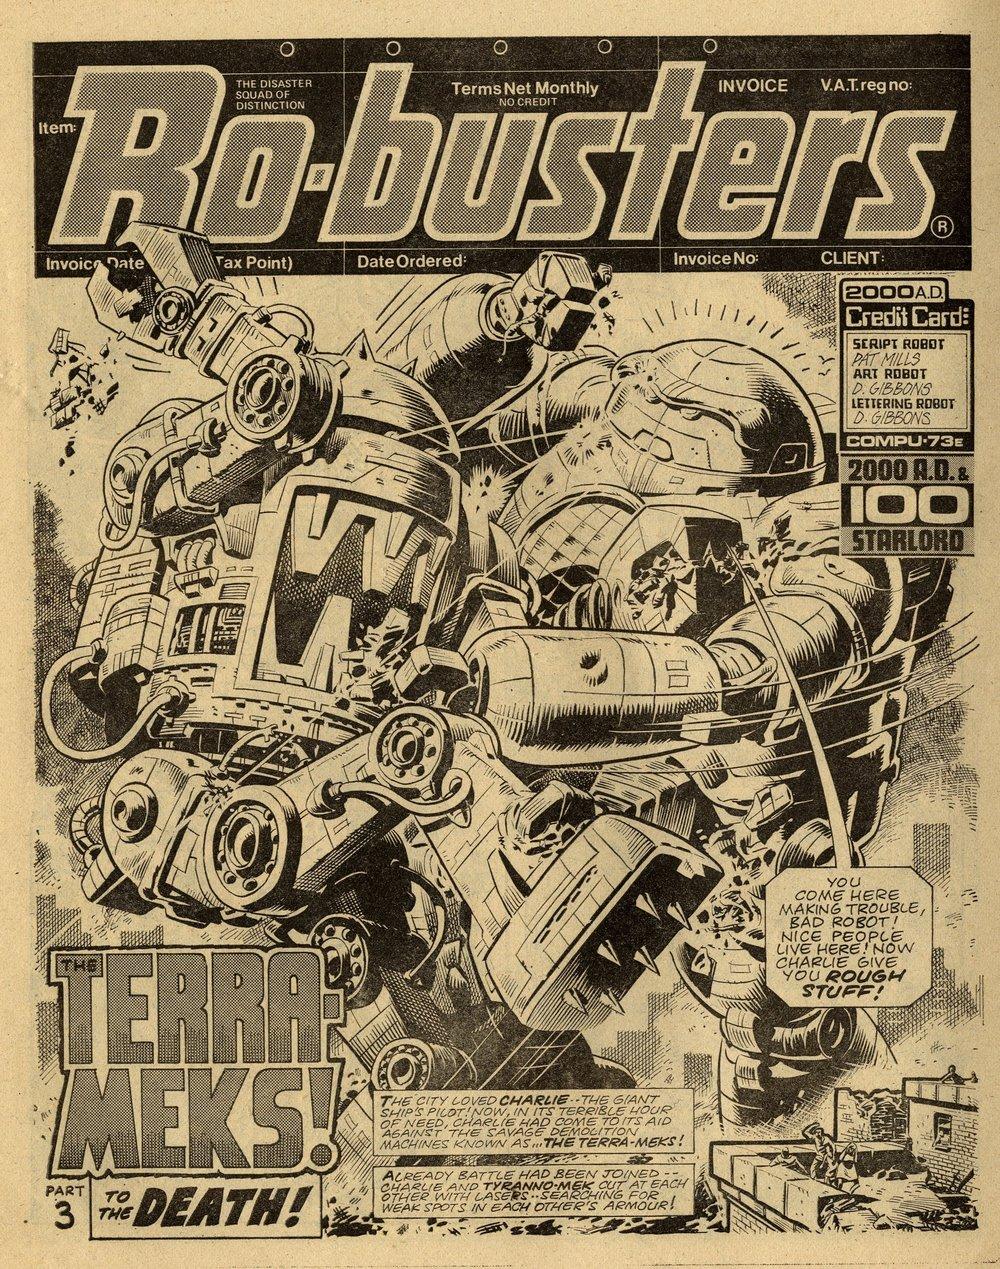 Ro-busters: 'The Terra-meks': Pat Mills (writer), Dave Gibbons (artist)